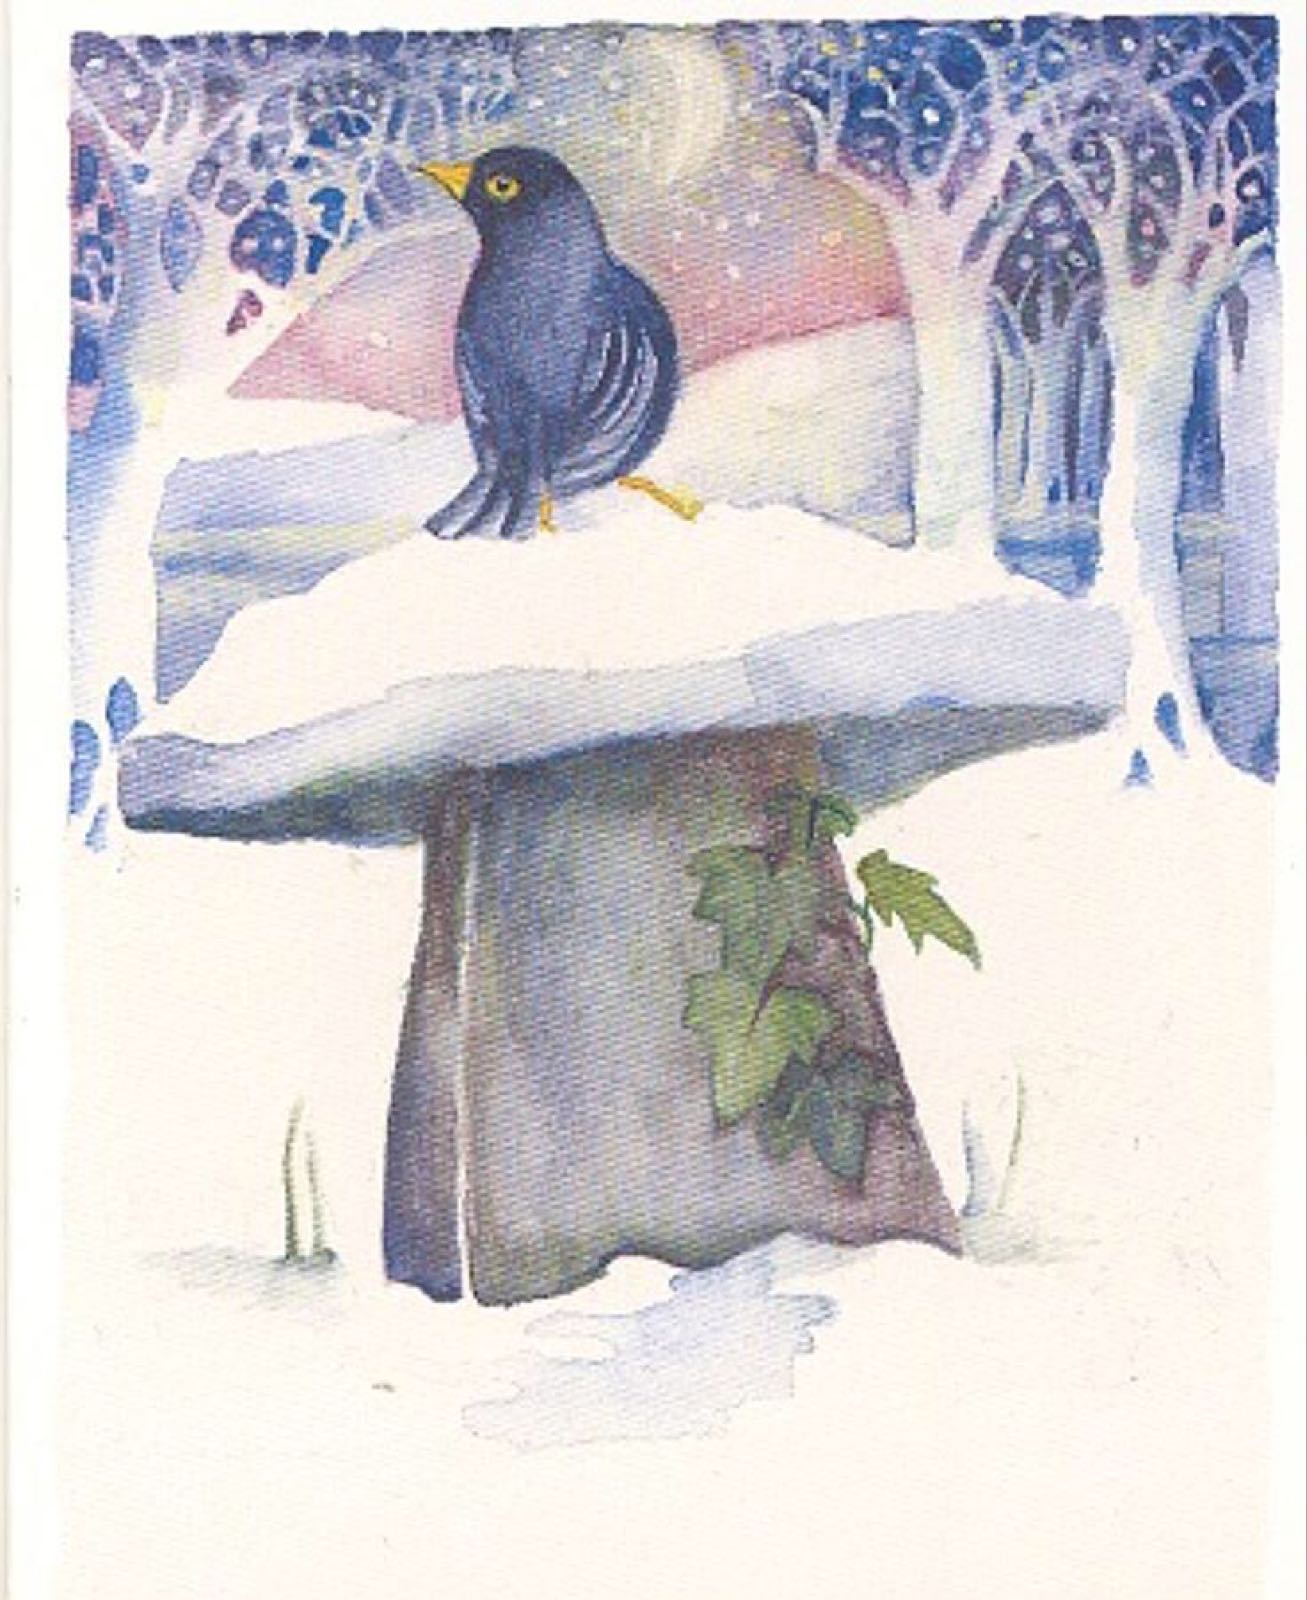 'Blackbird Singing in the Dead of Night' Furzedown Gallery Mini Card